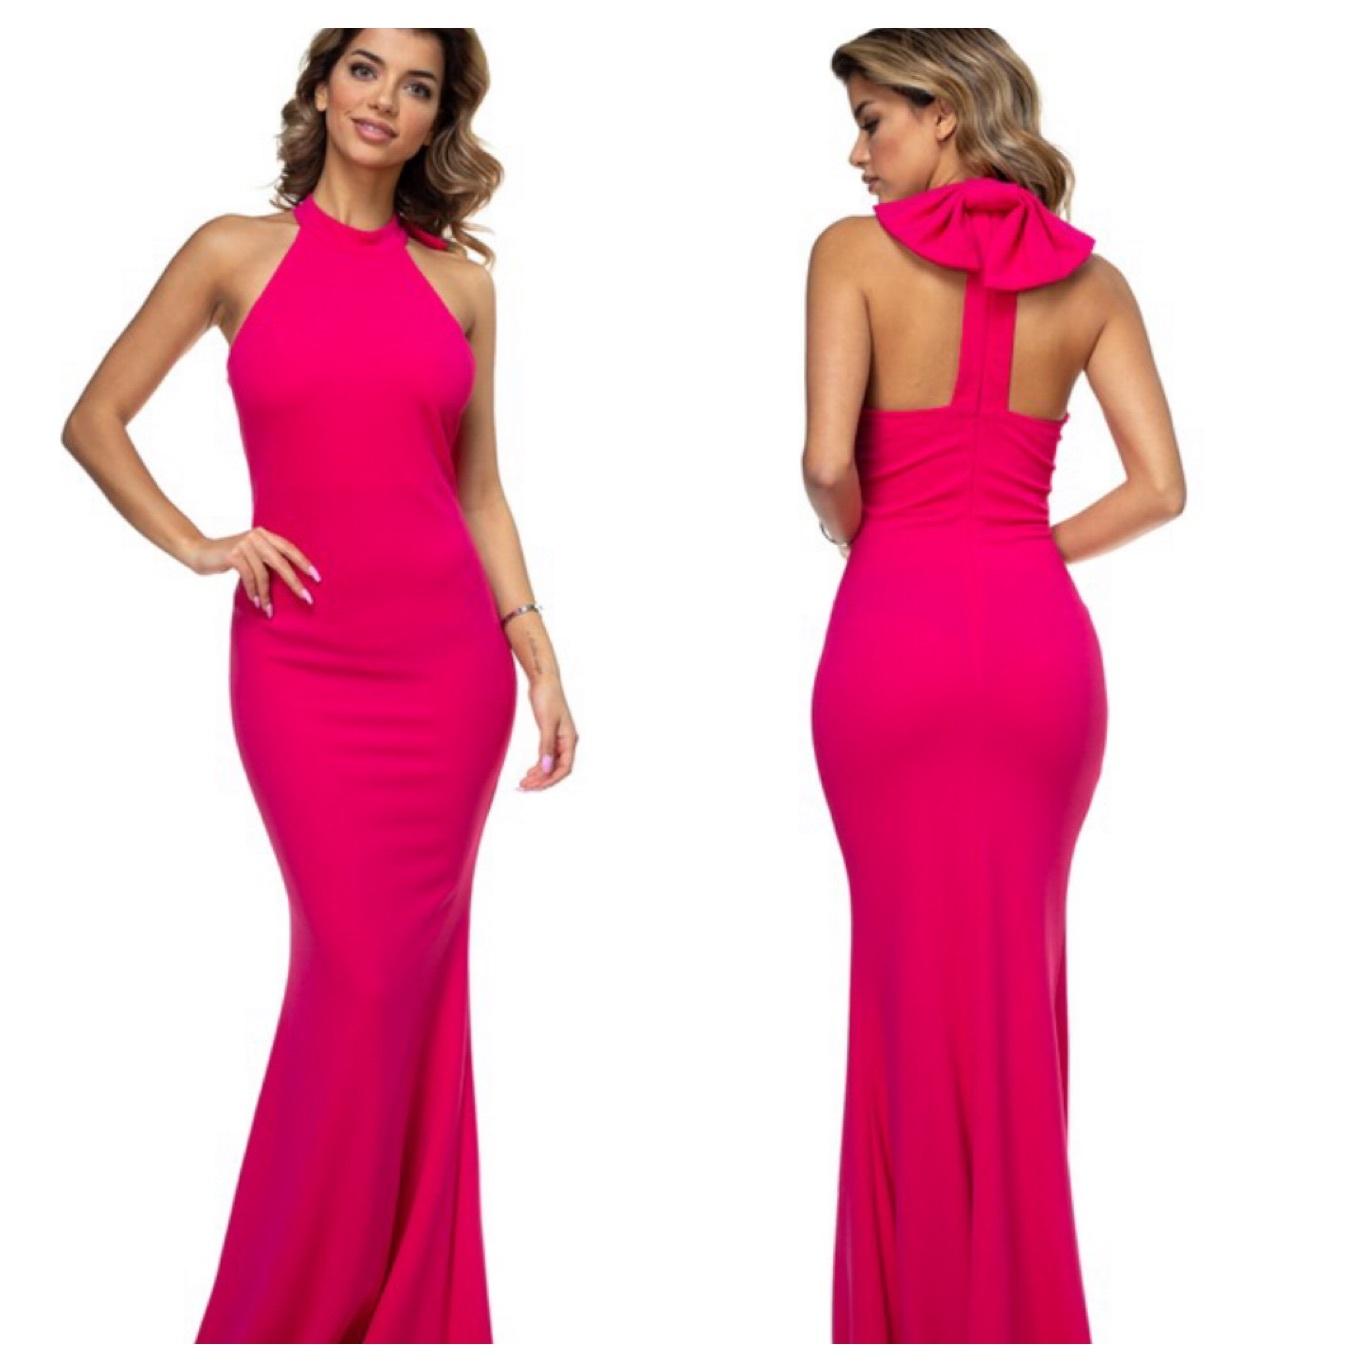 PINK DRESS   $65